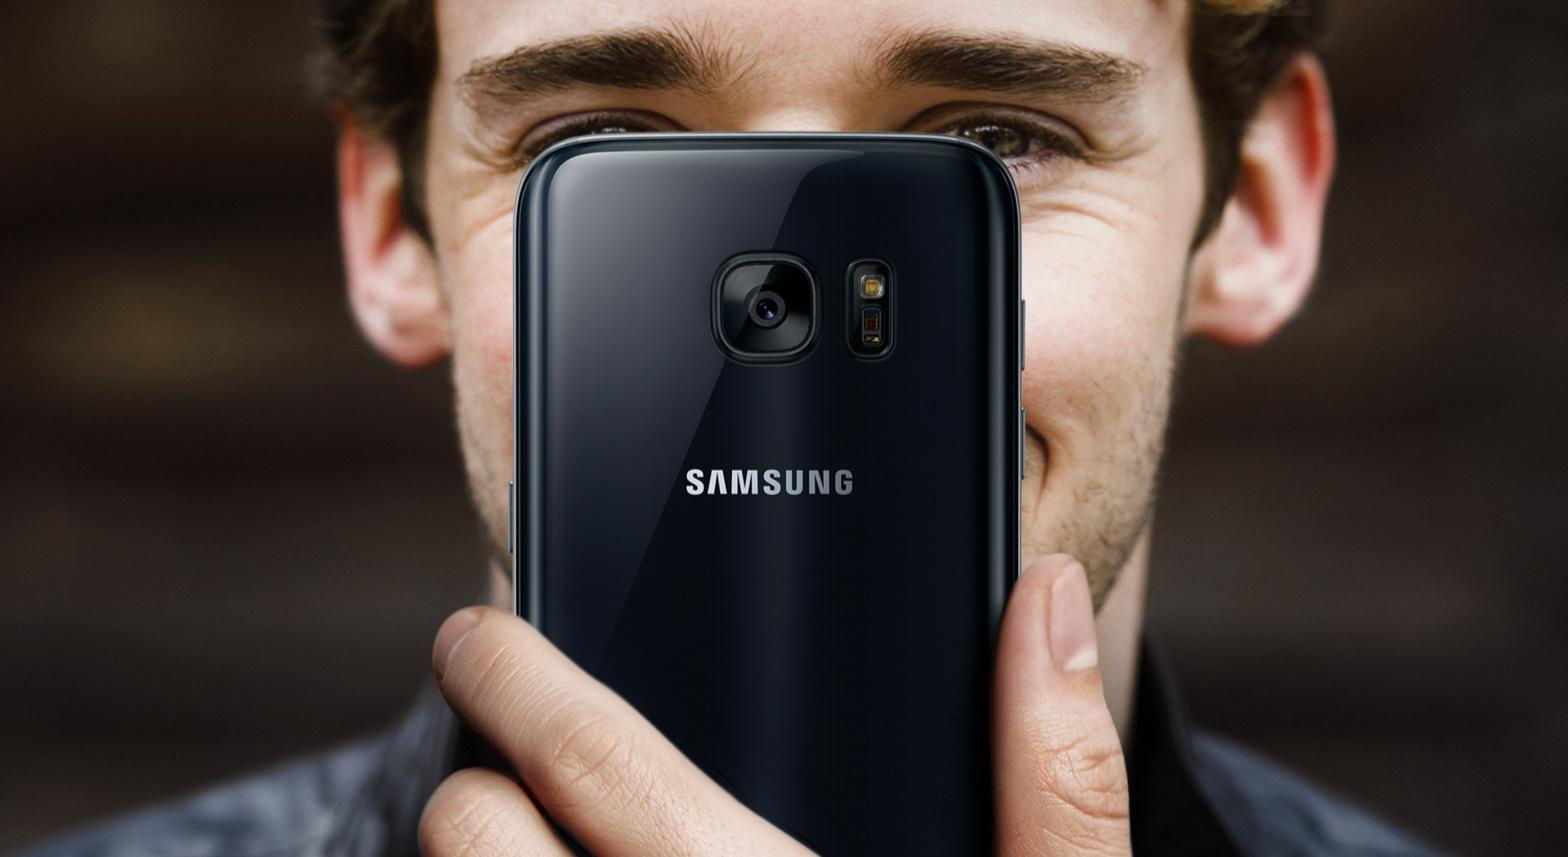 Samsung-Galaxy-S7-and-S7-Edge (13)